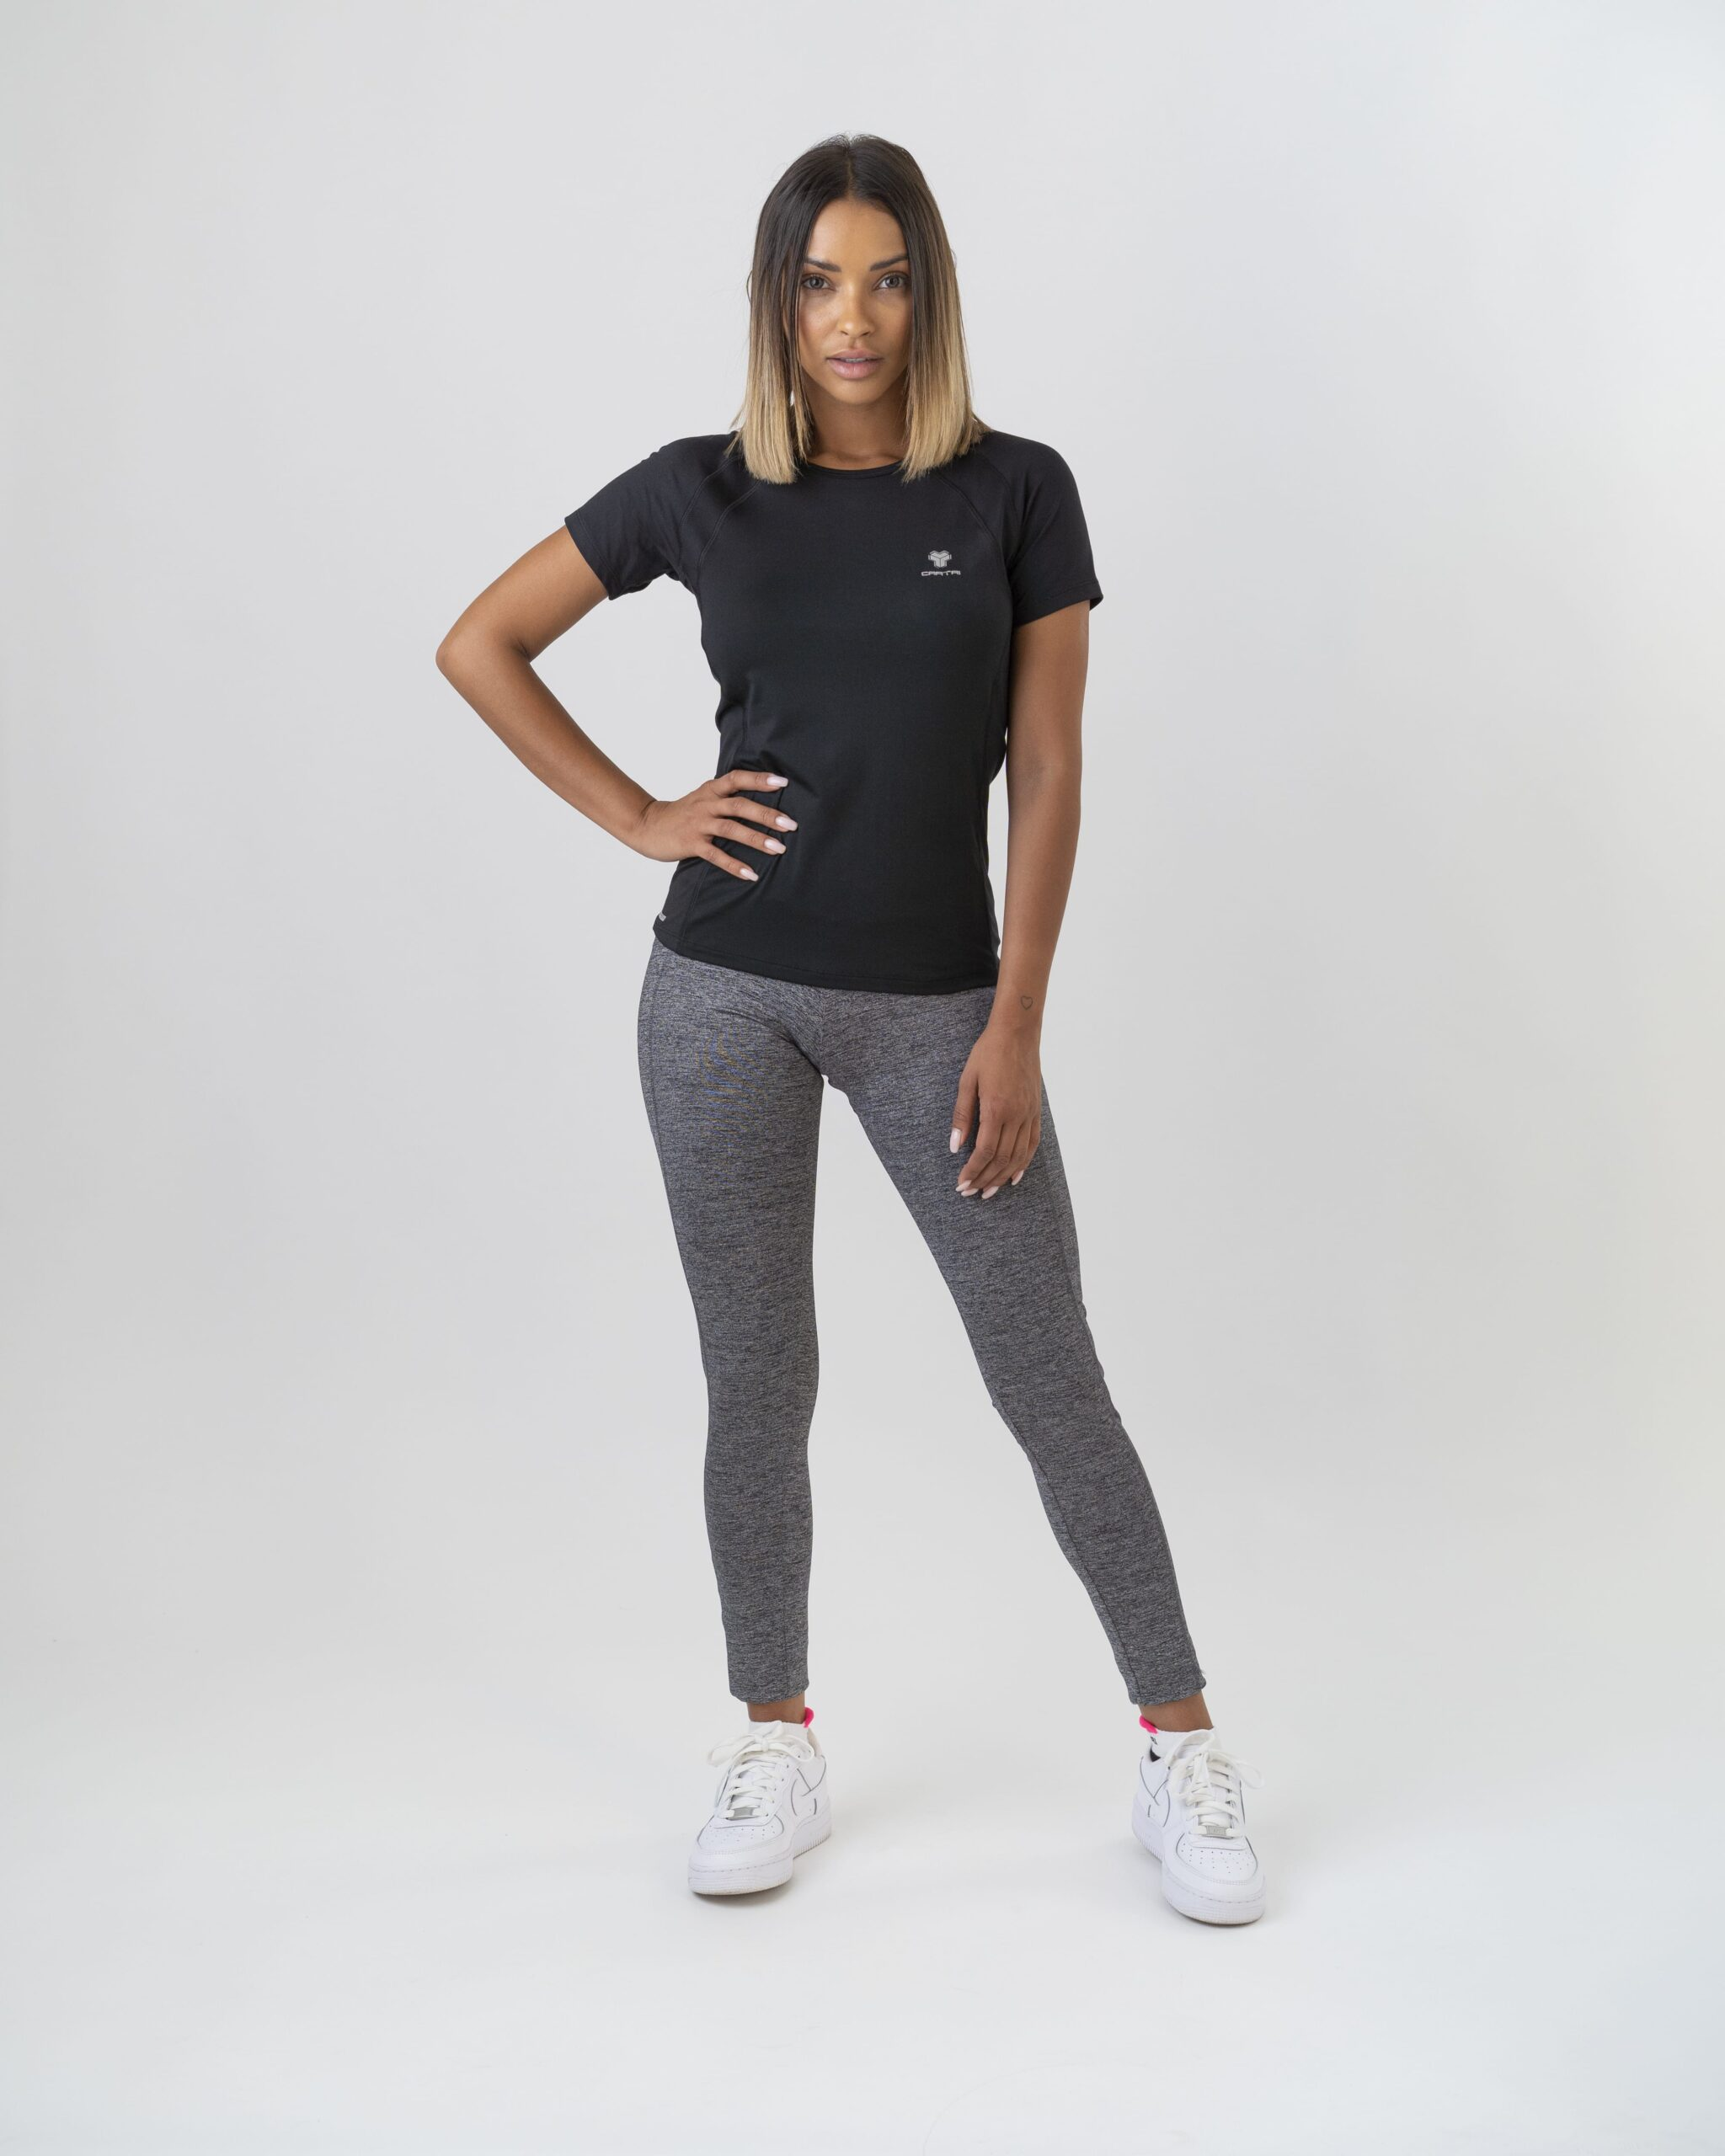 Tシャツシュタイアーブラックレギンスグレーリンツカルトリ女性2021年